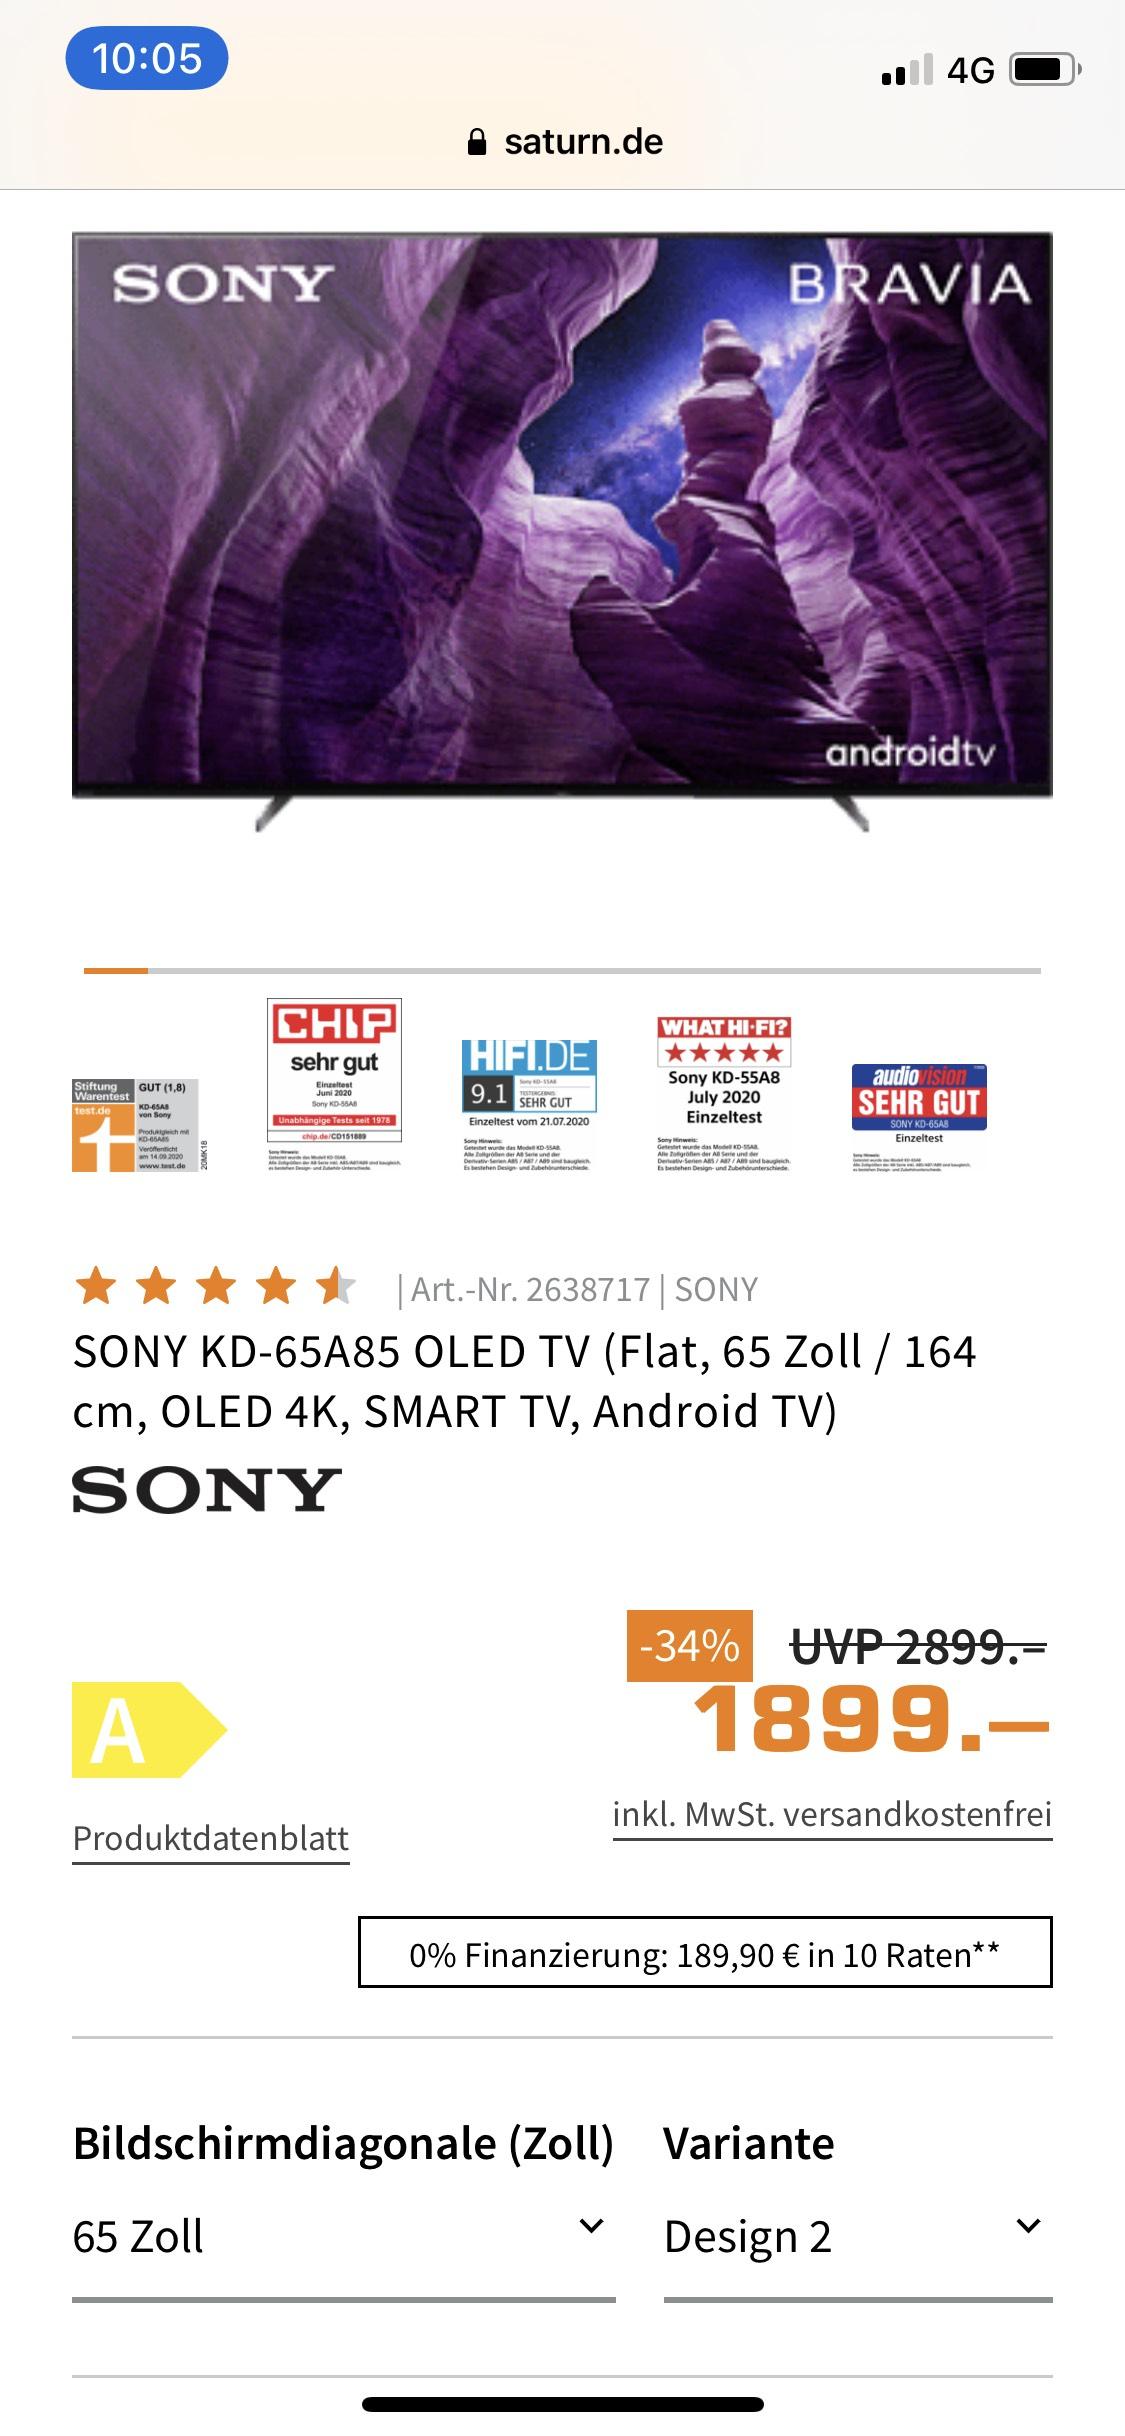 Sony KD-65A85